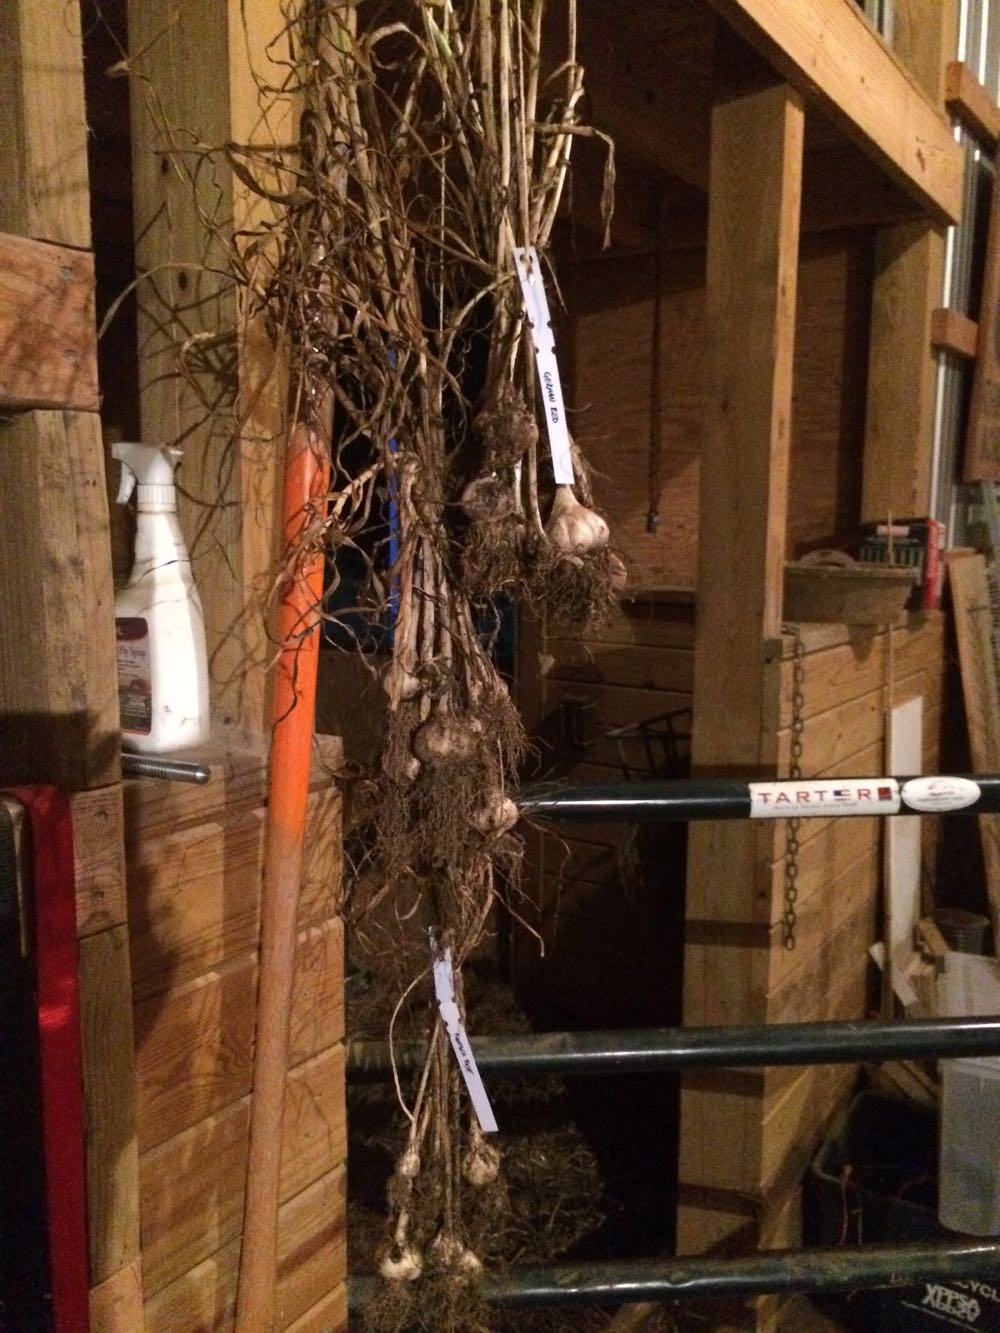 Garlic hanging in the barn